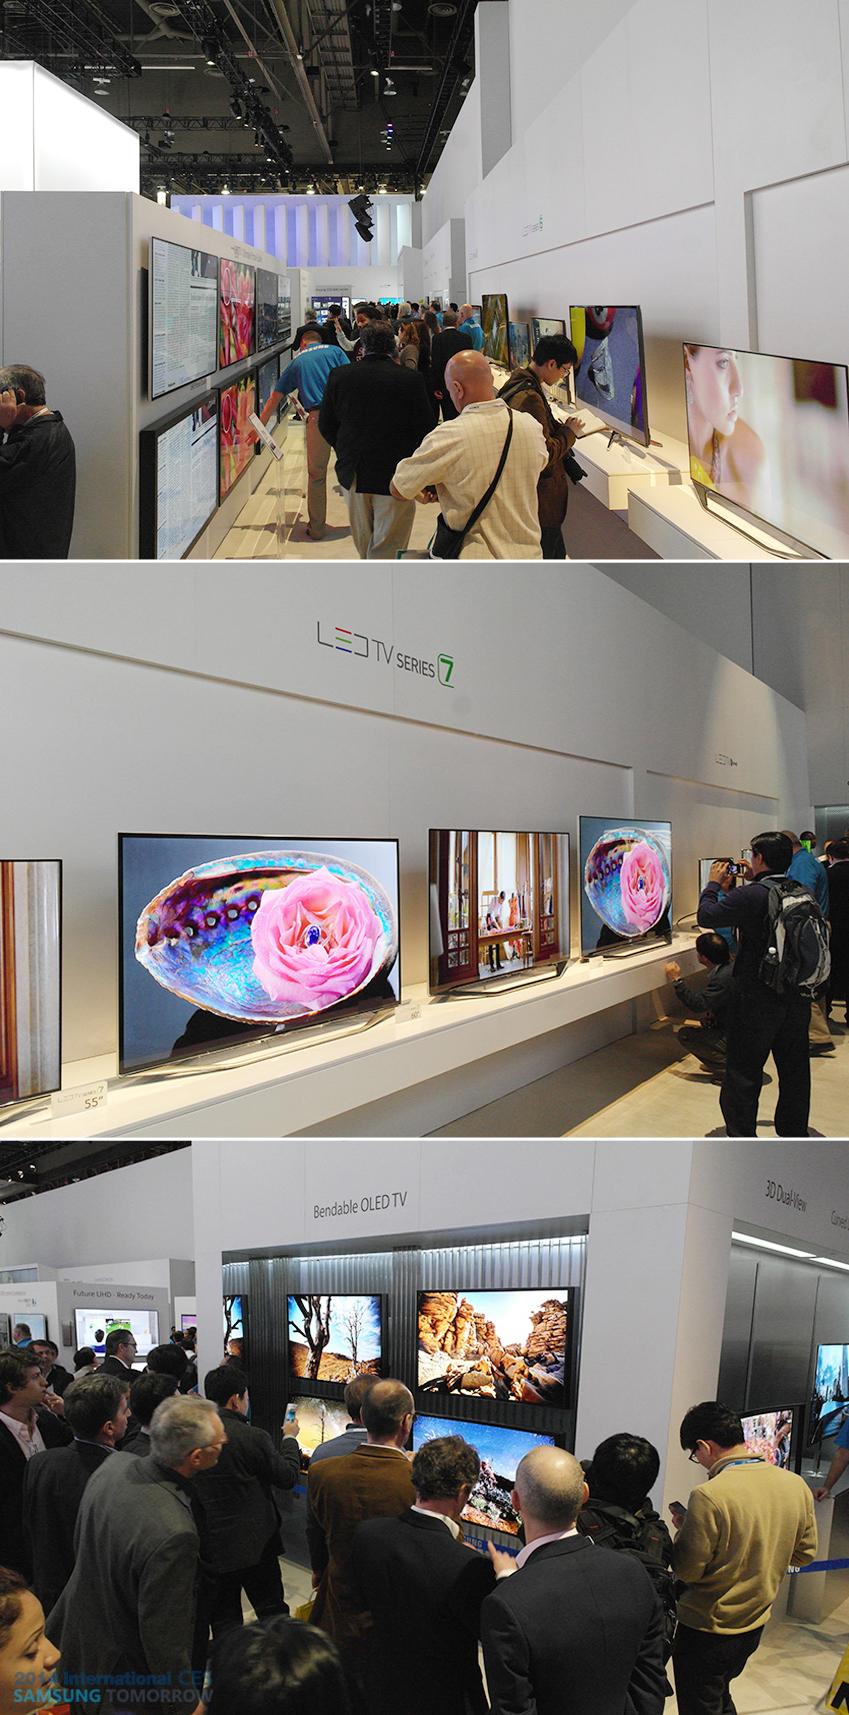 UHD TV, LED TV 시리즈7과 밴더블(Bendable) OLED TV를 구경하는 사람들 사진입니다.